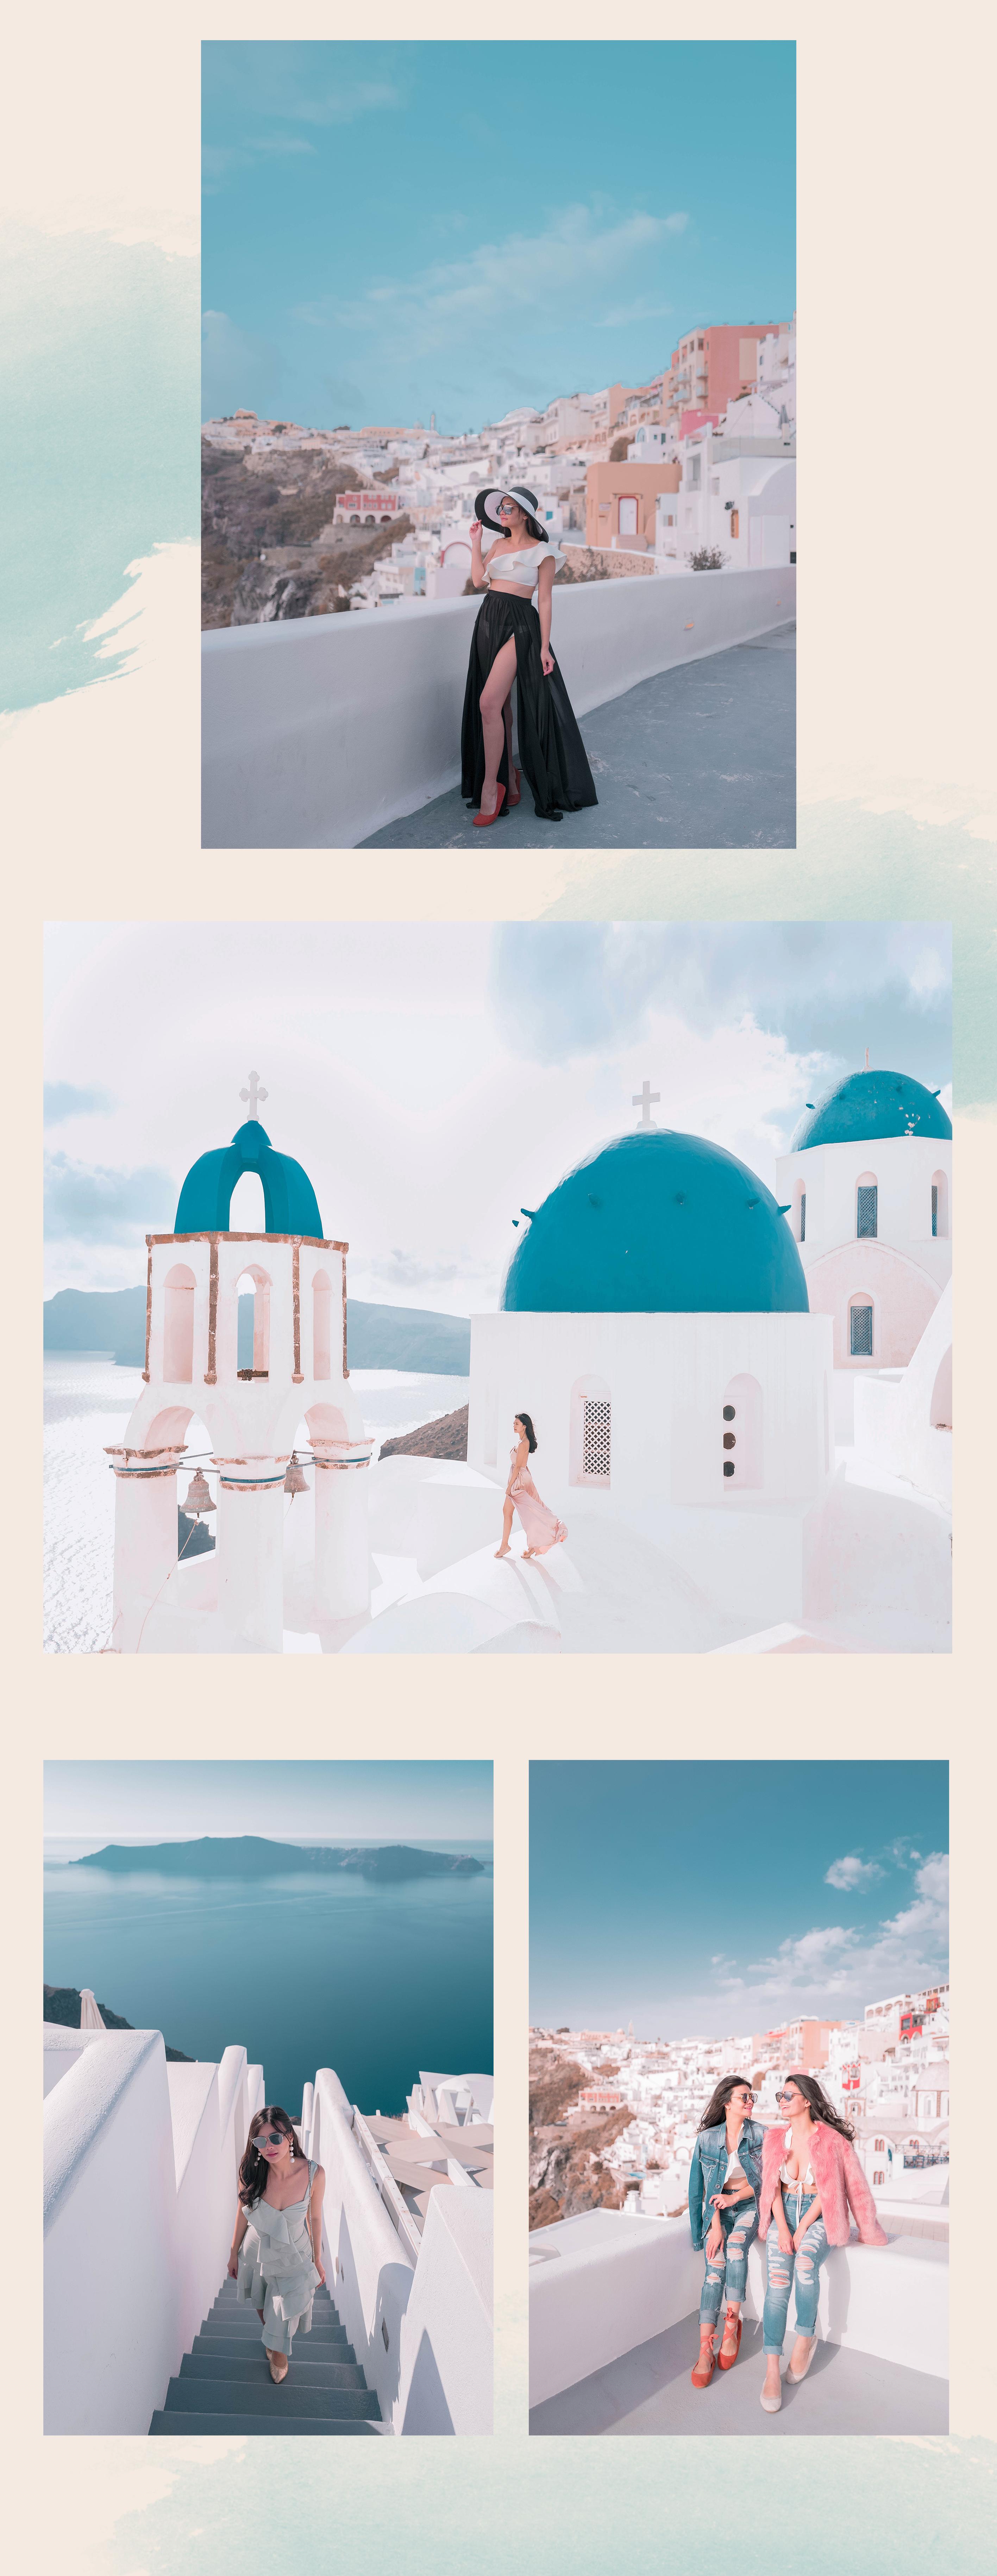 7. VnV Greece 4